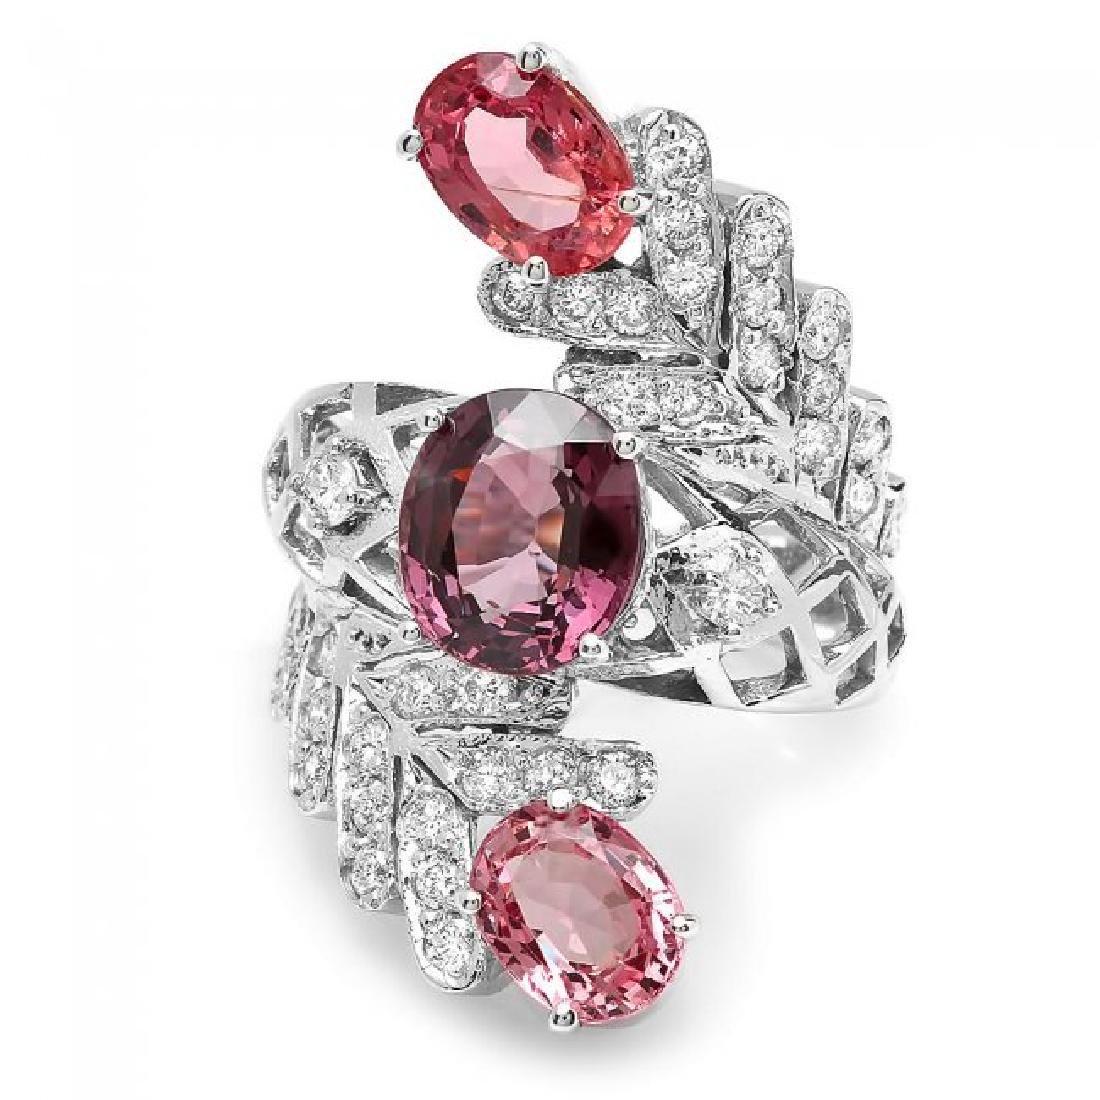 14k White Gold 5.5ct Spinel 1.00ct Diamond Ring - 2